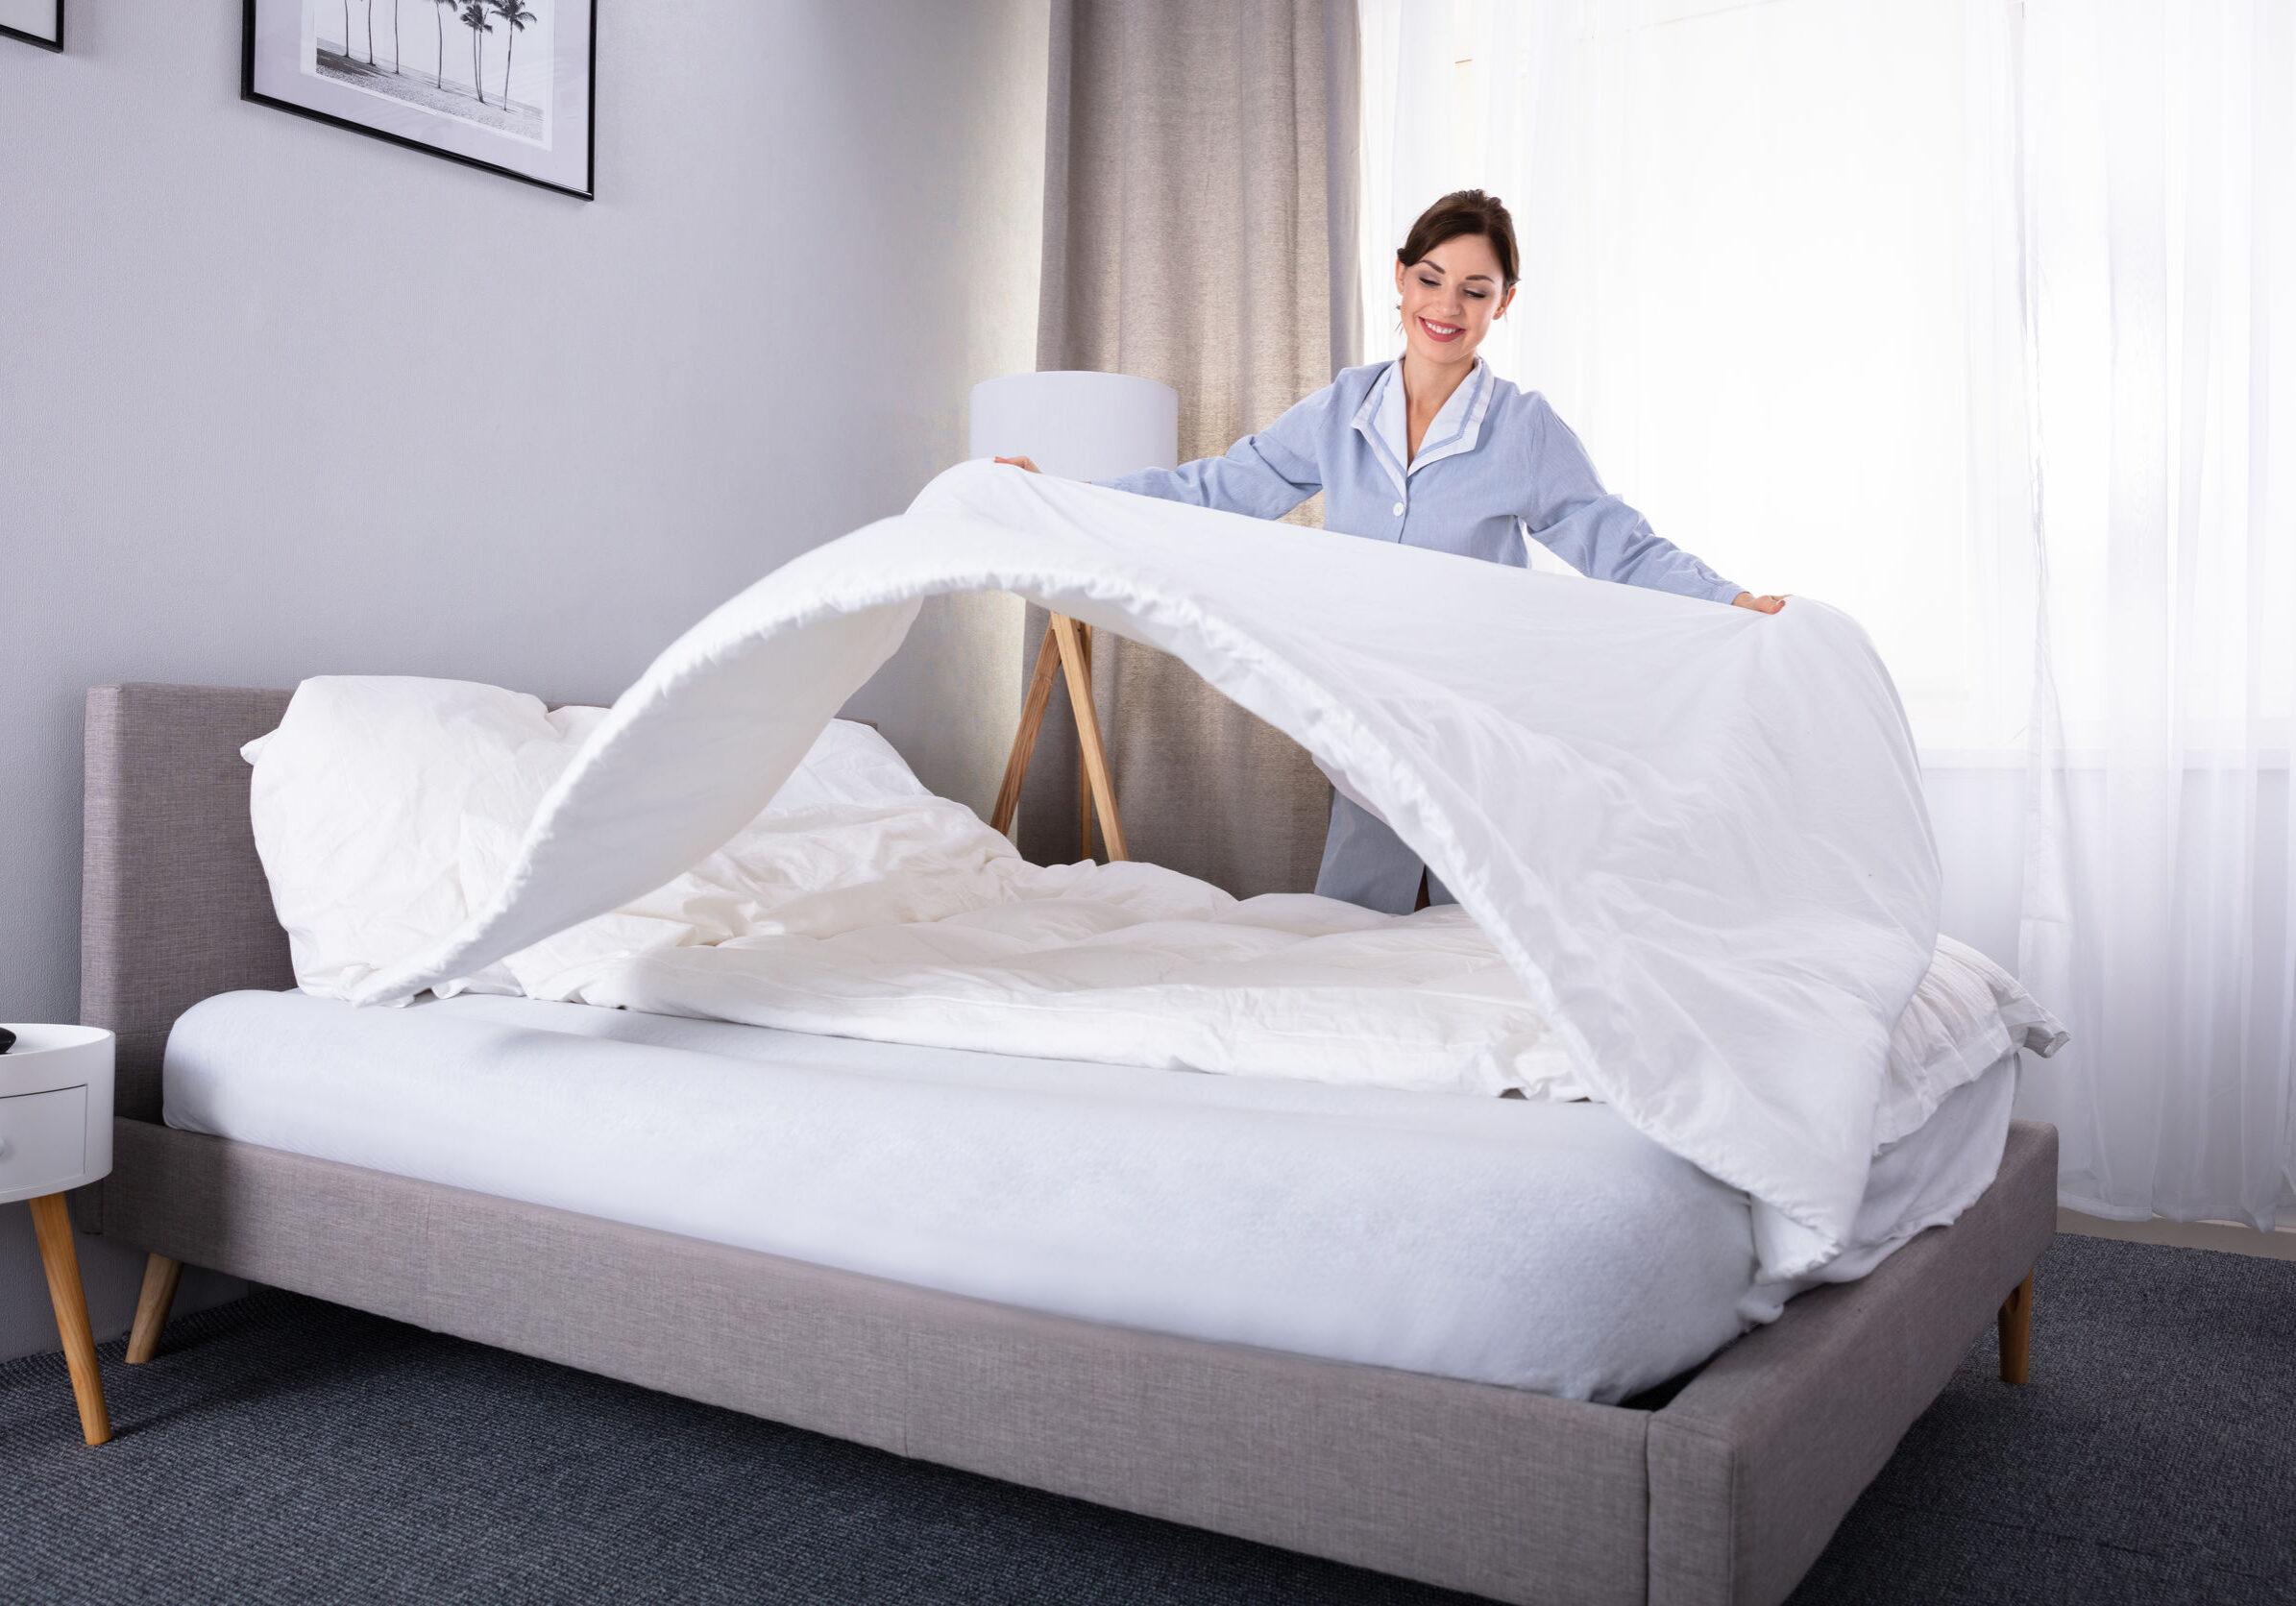 Pest Control in Hotels